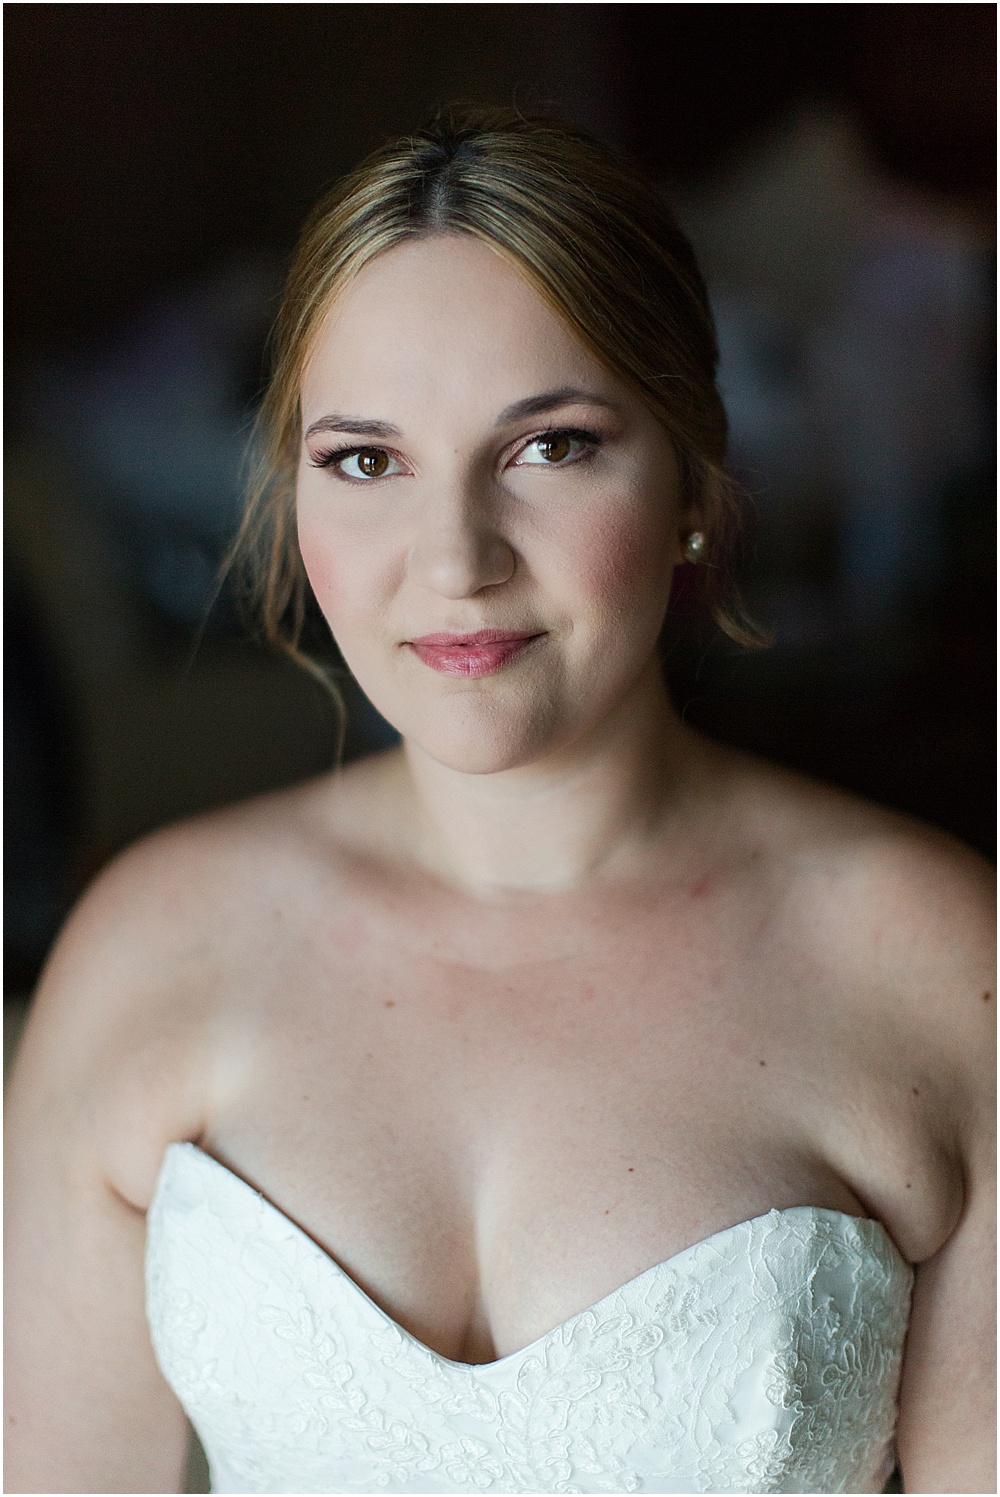 mitzner_silverdale_beach_hotel_wedding_silverdale_washington_pacific_northwest_wedding_photographer_0127